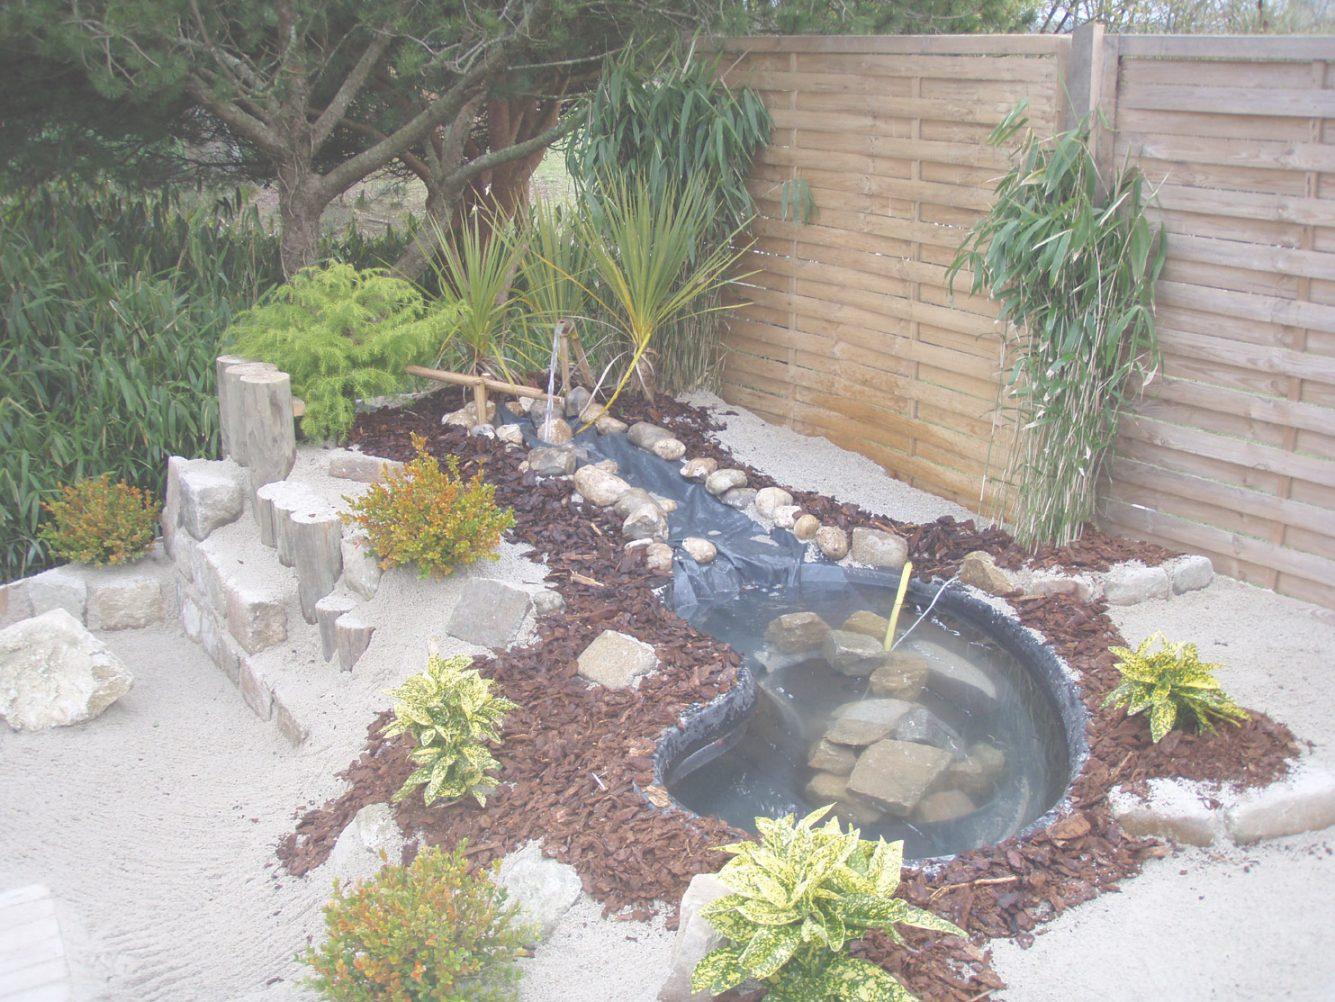 Creer Un Coin Zen Dans Son Jardin créer un jardin zen creer un coin zen dans son jardin et